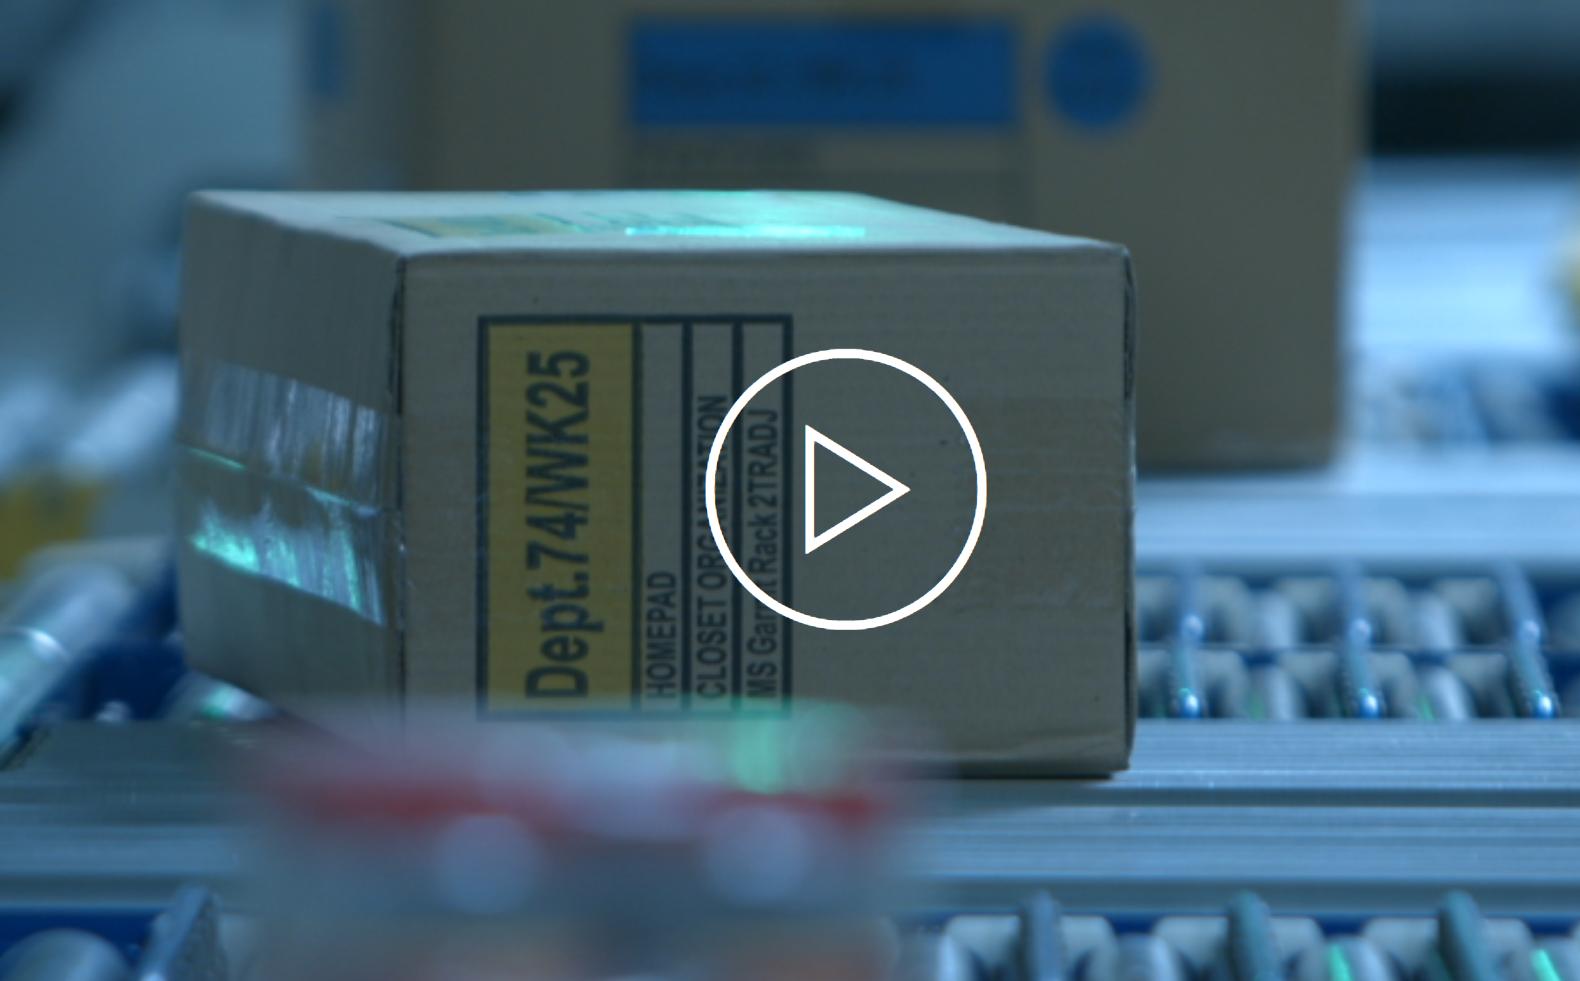 Walmart's New FAST Unloader Shows Intelligence of Motor-Driven Roller Conveyors